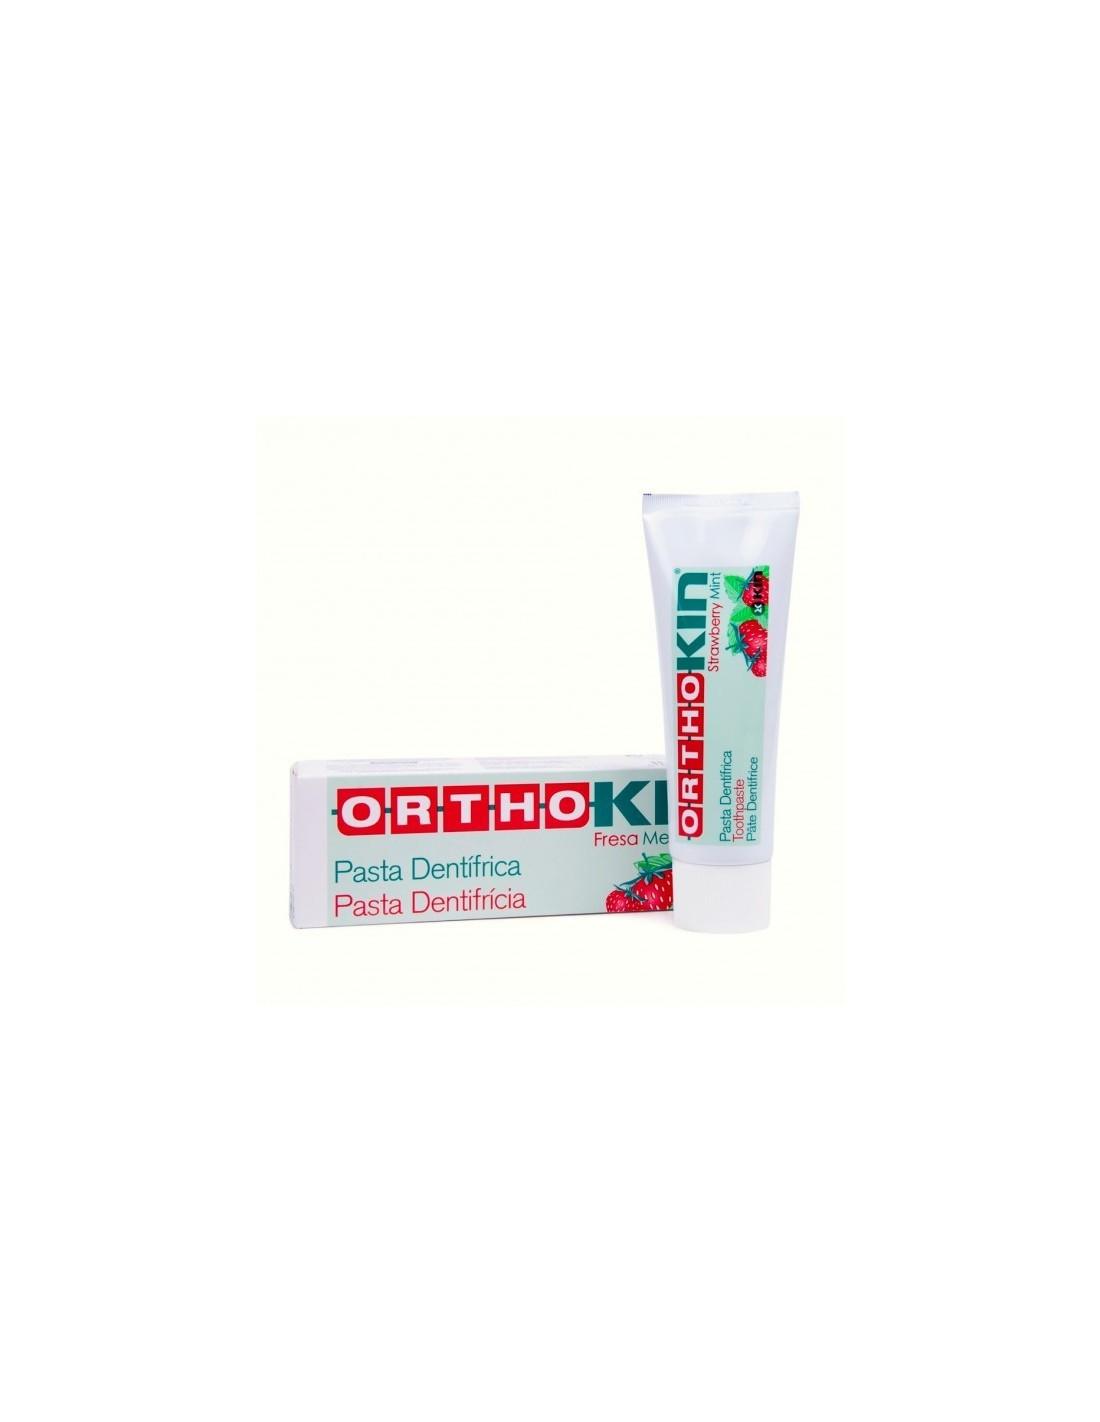 ORTHOKIN PASTA DENTIFRICA  75 ML FRESA MENTOLADA